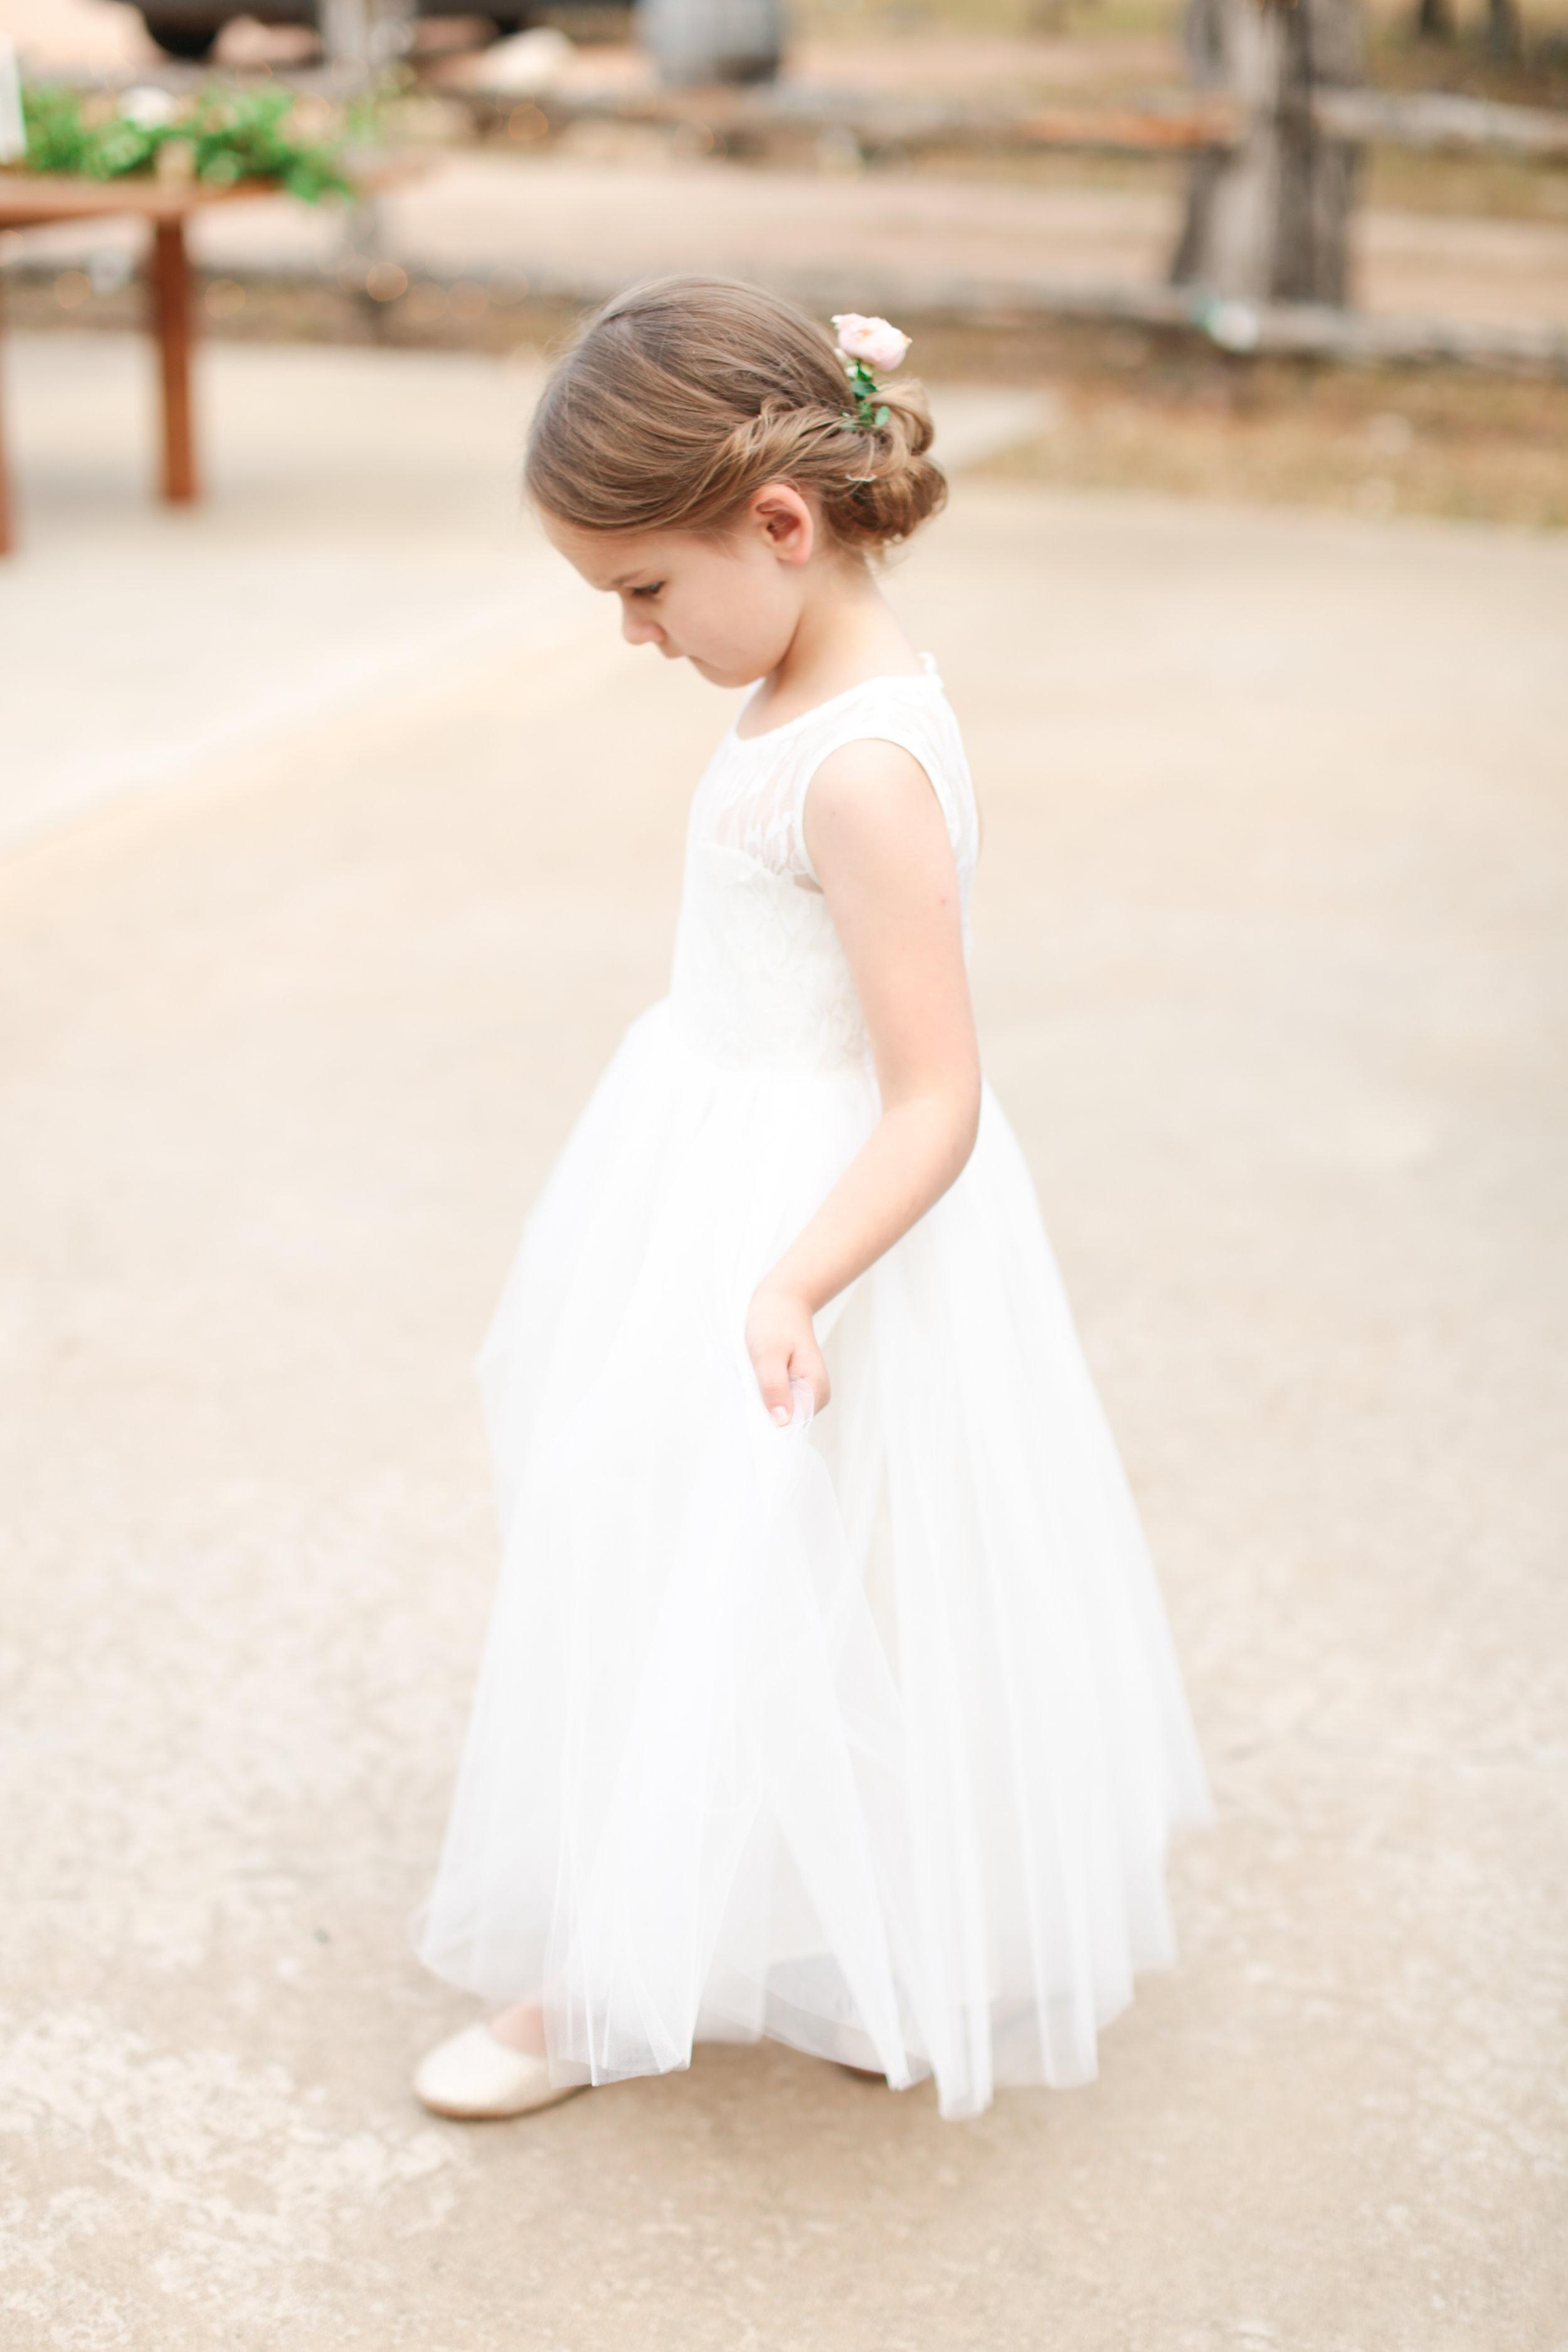 Lewis Wedding Collection - Shara Jo Photography-106.jpg